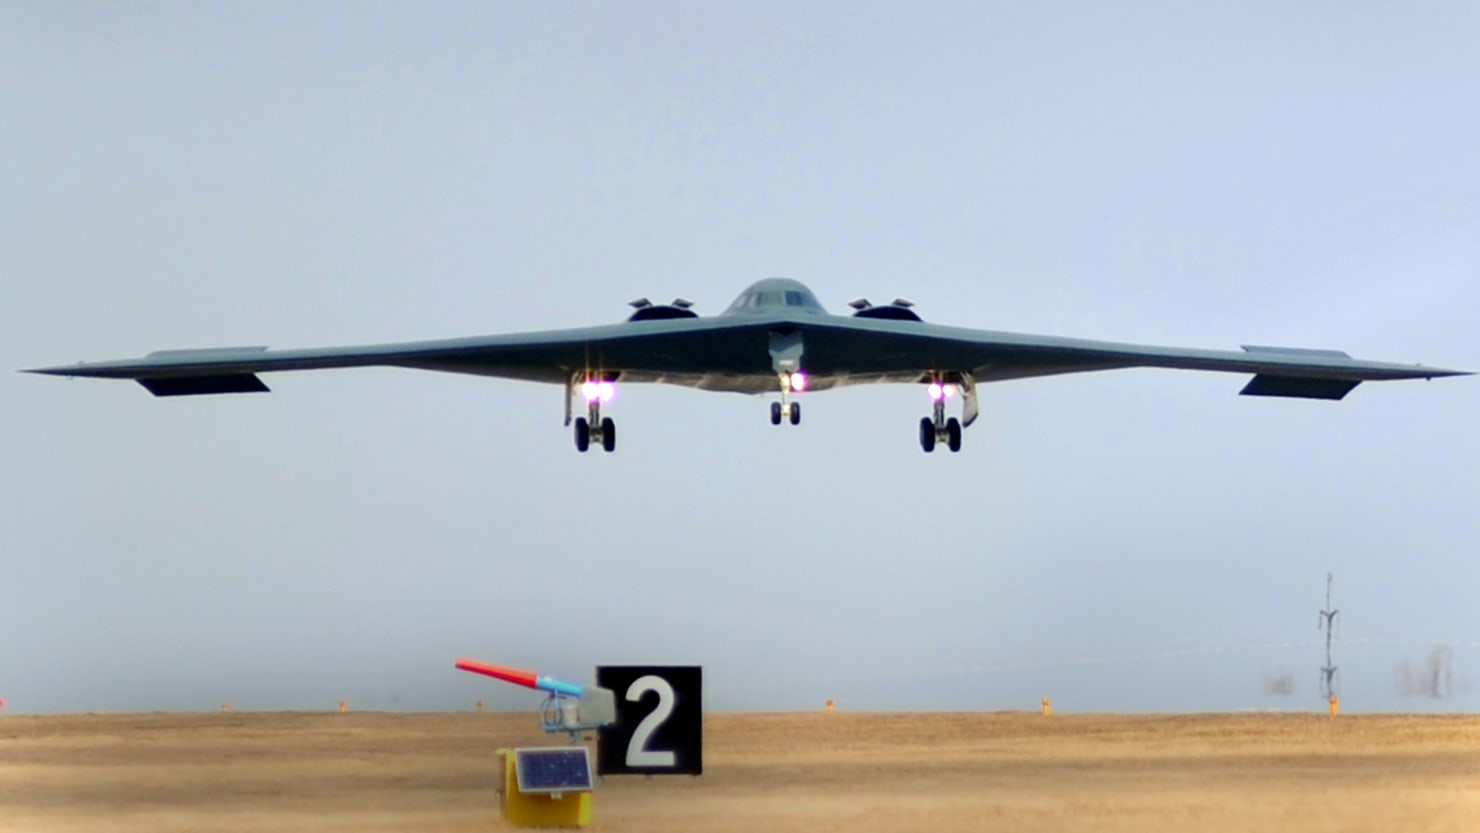 U.S. Strategic Command Releases Bizarre Video Teasing Nuclear Bomb Drop